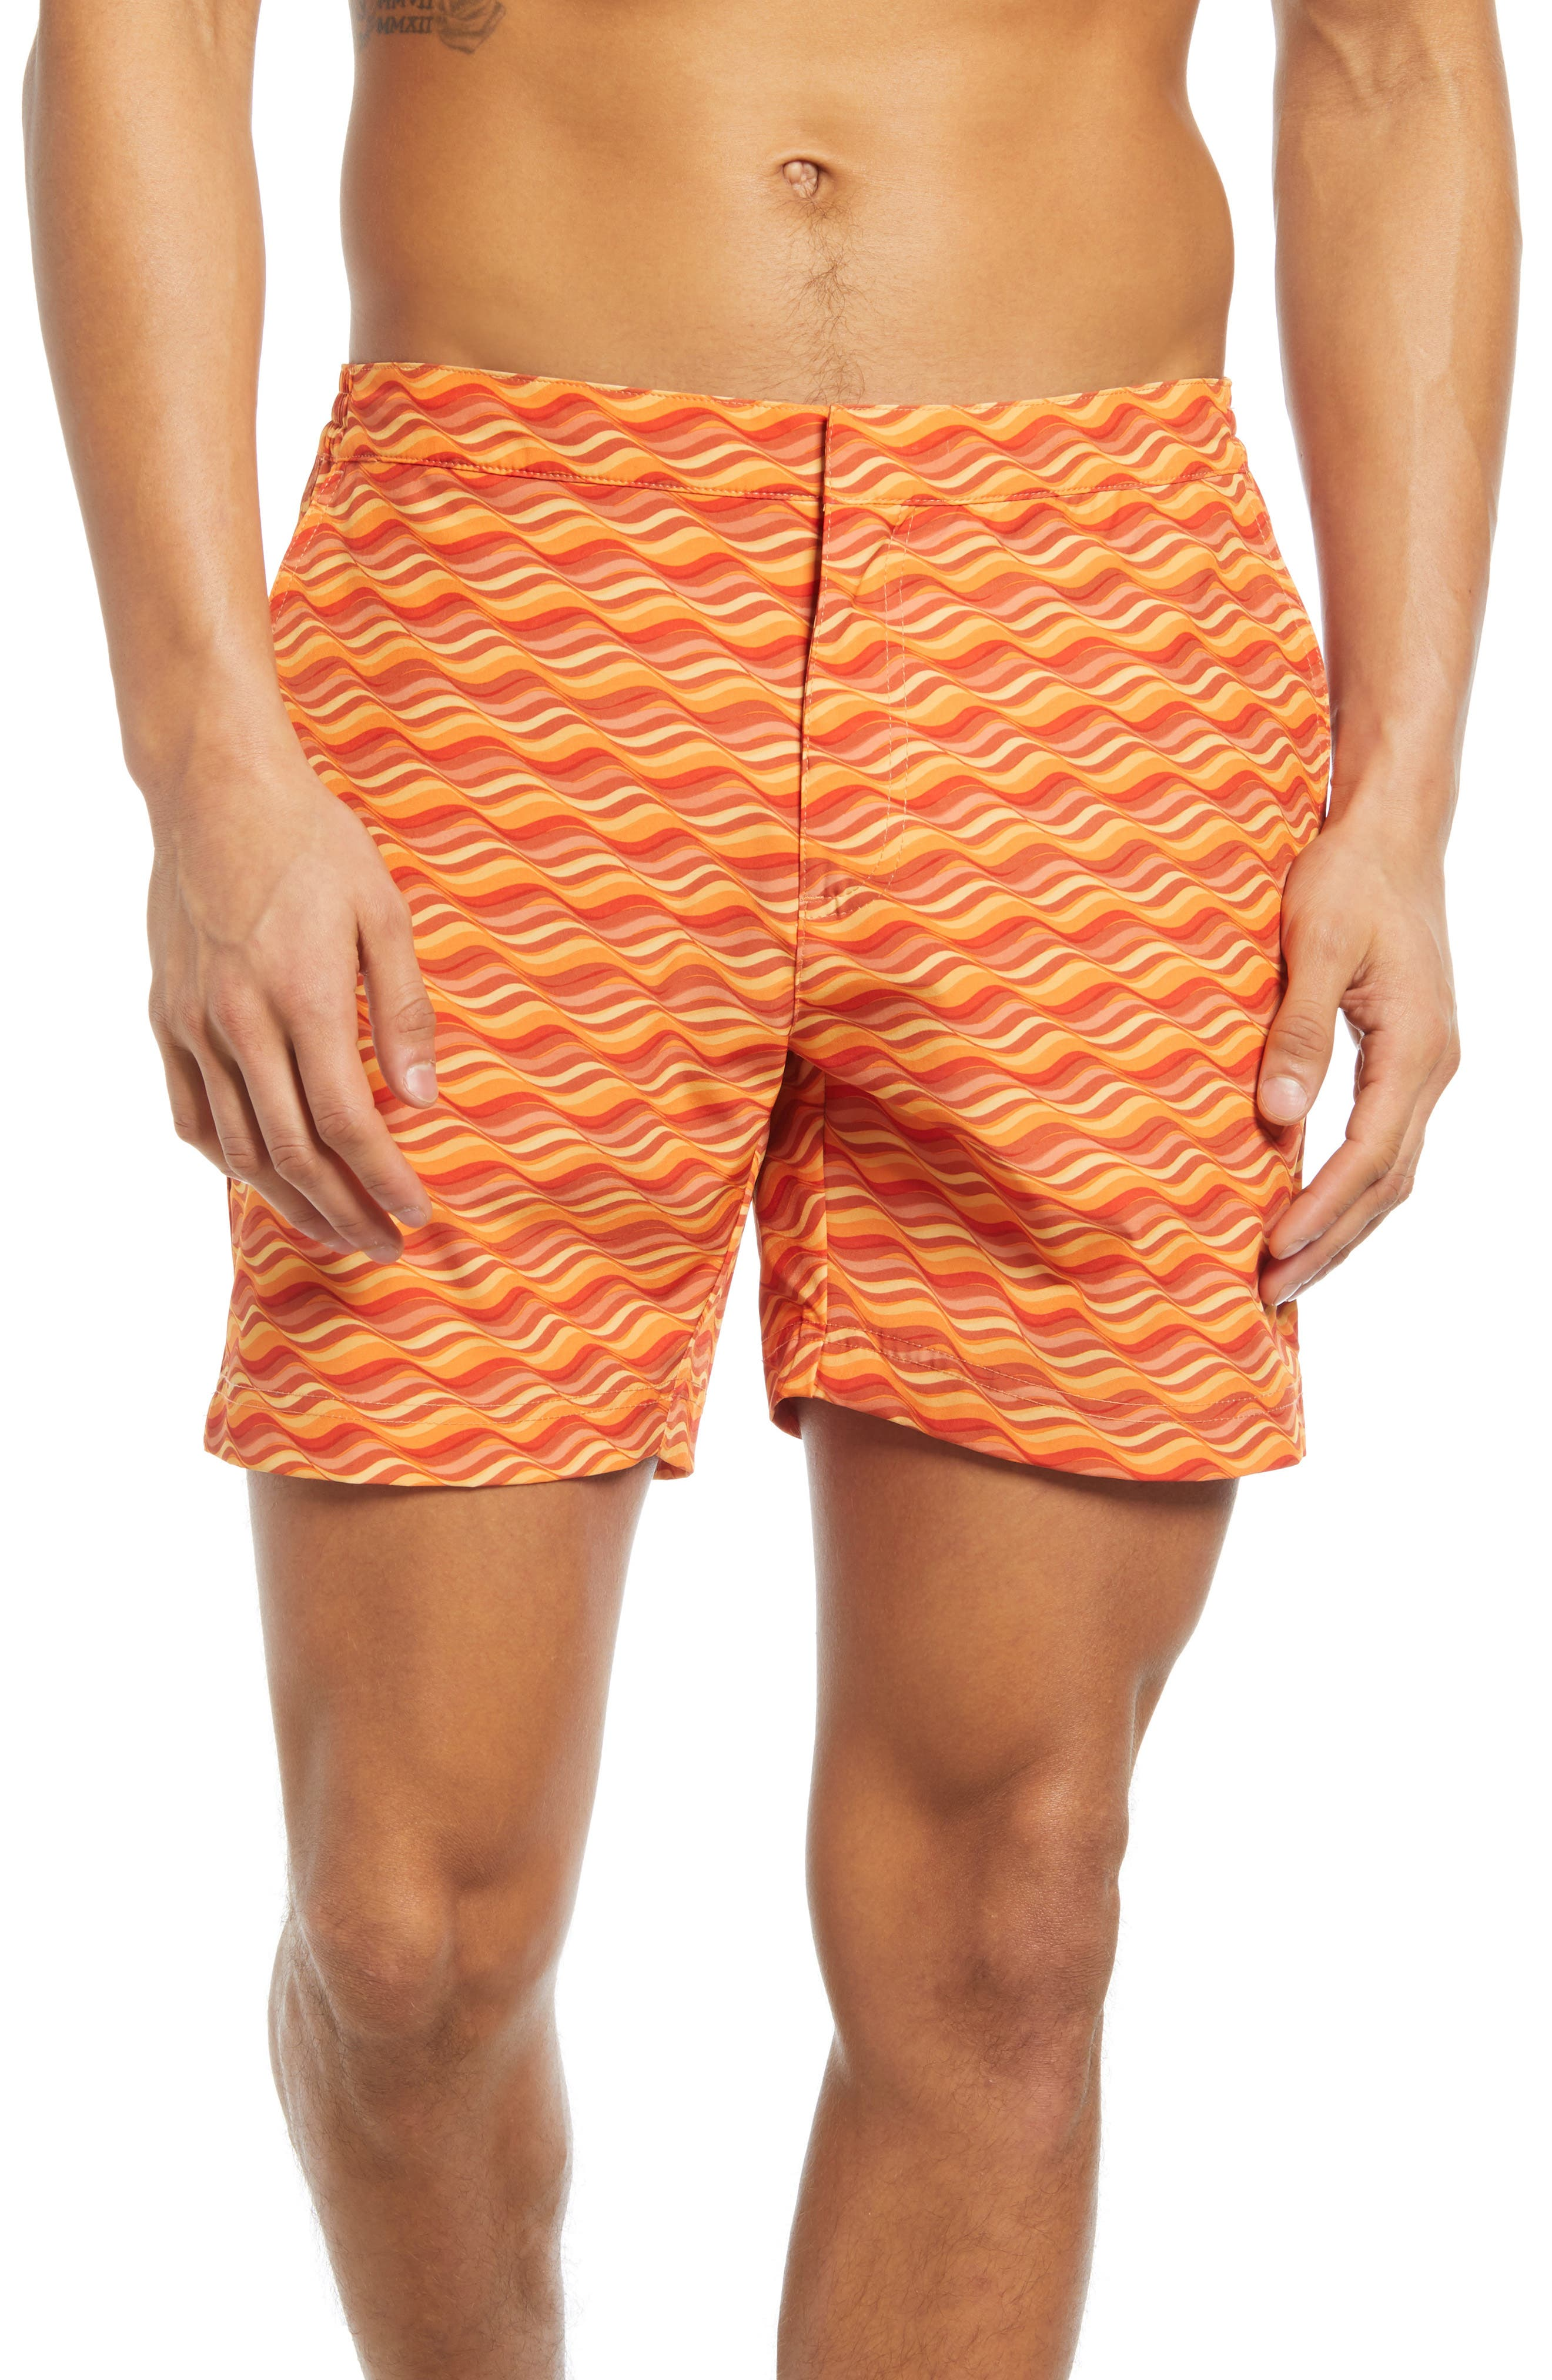 Vintage Men's Swimsuits – 1930s, 1940s, 1950s History Mens Fair Harbor The Sextant Wave Print Swim Trunks Size 36 - Orange $88.00 AT vintagedancer.com